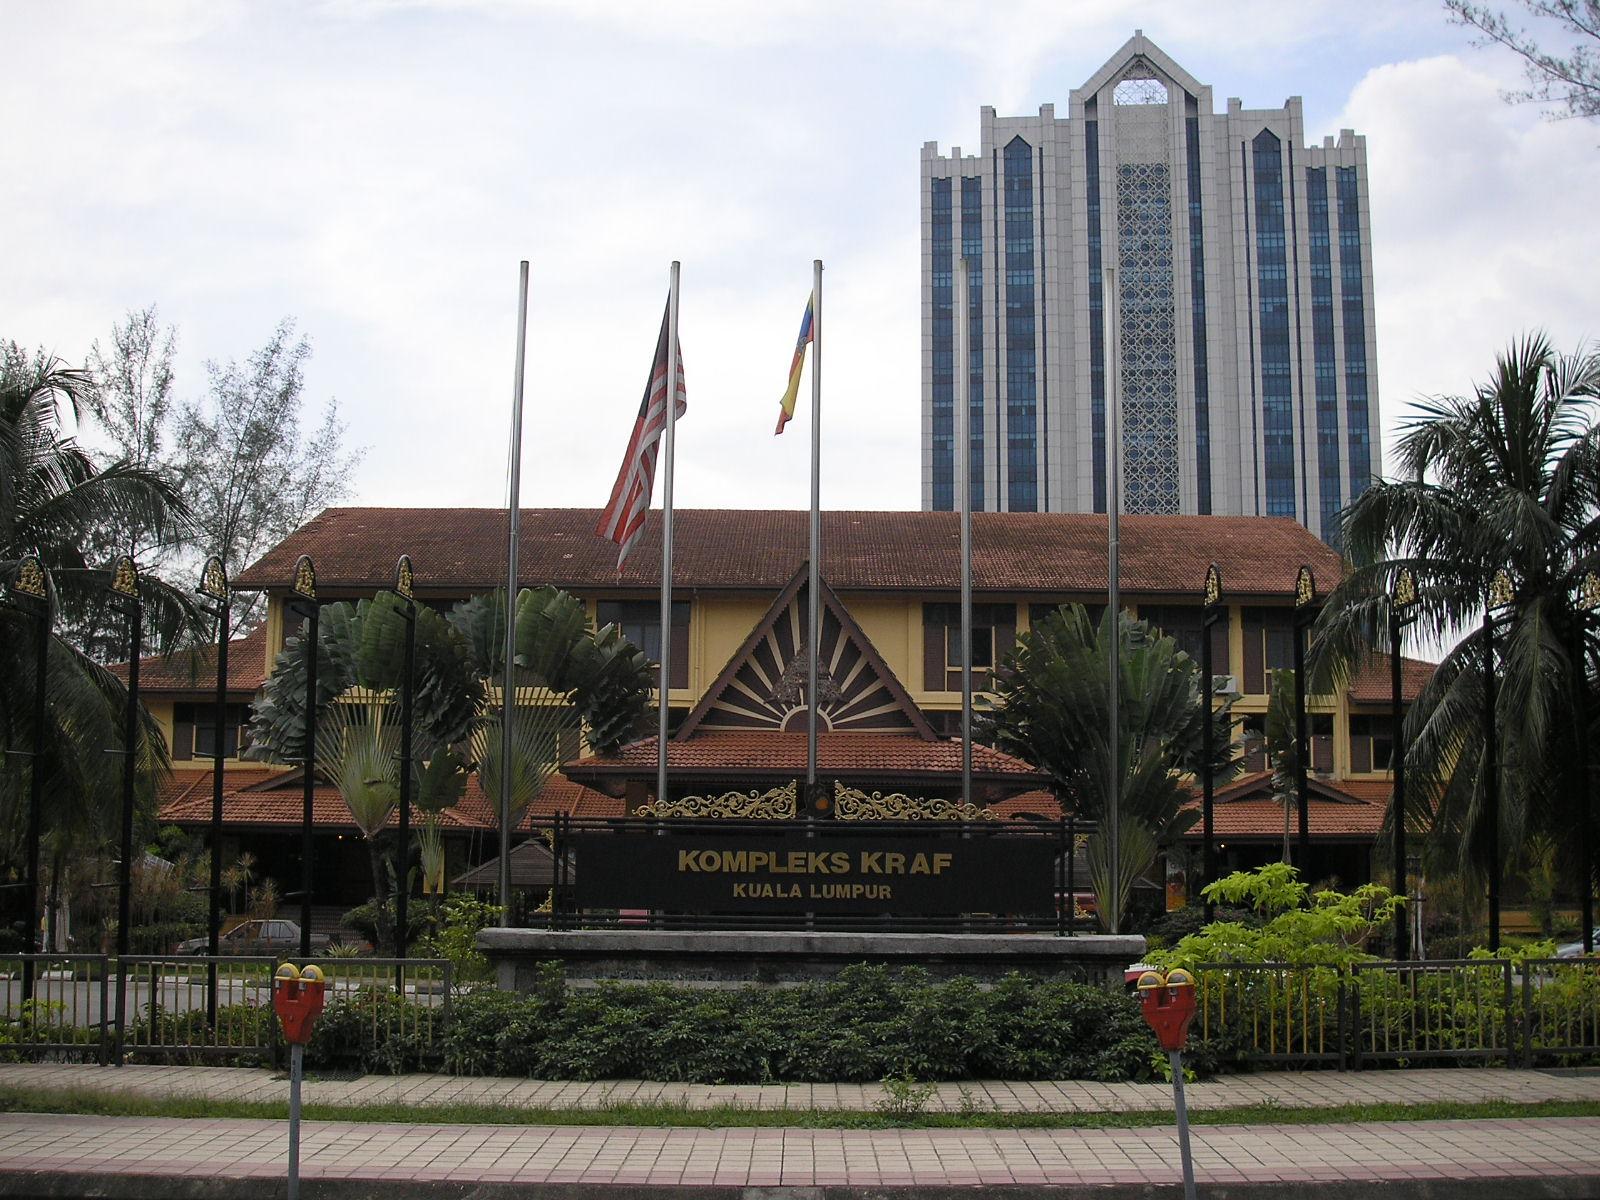 Kompleks Kraf Jalan Conlay Kuala Lumpur